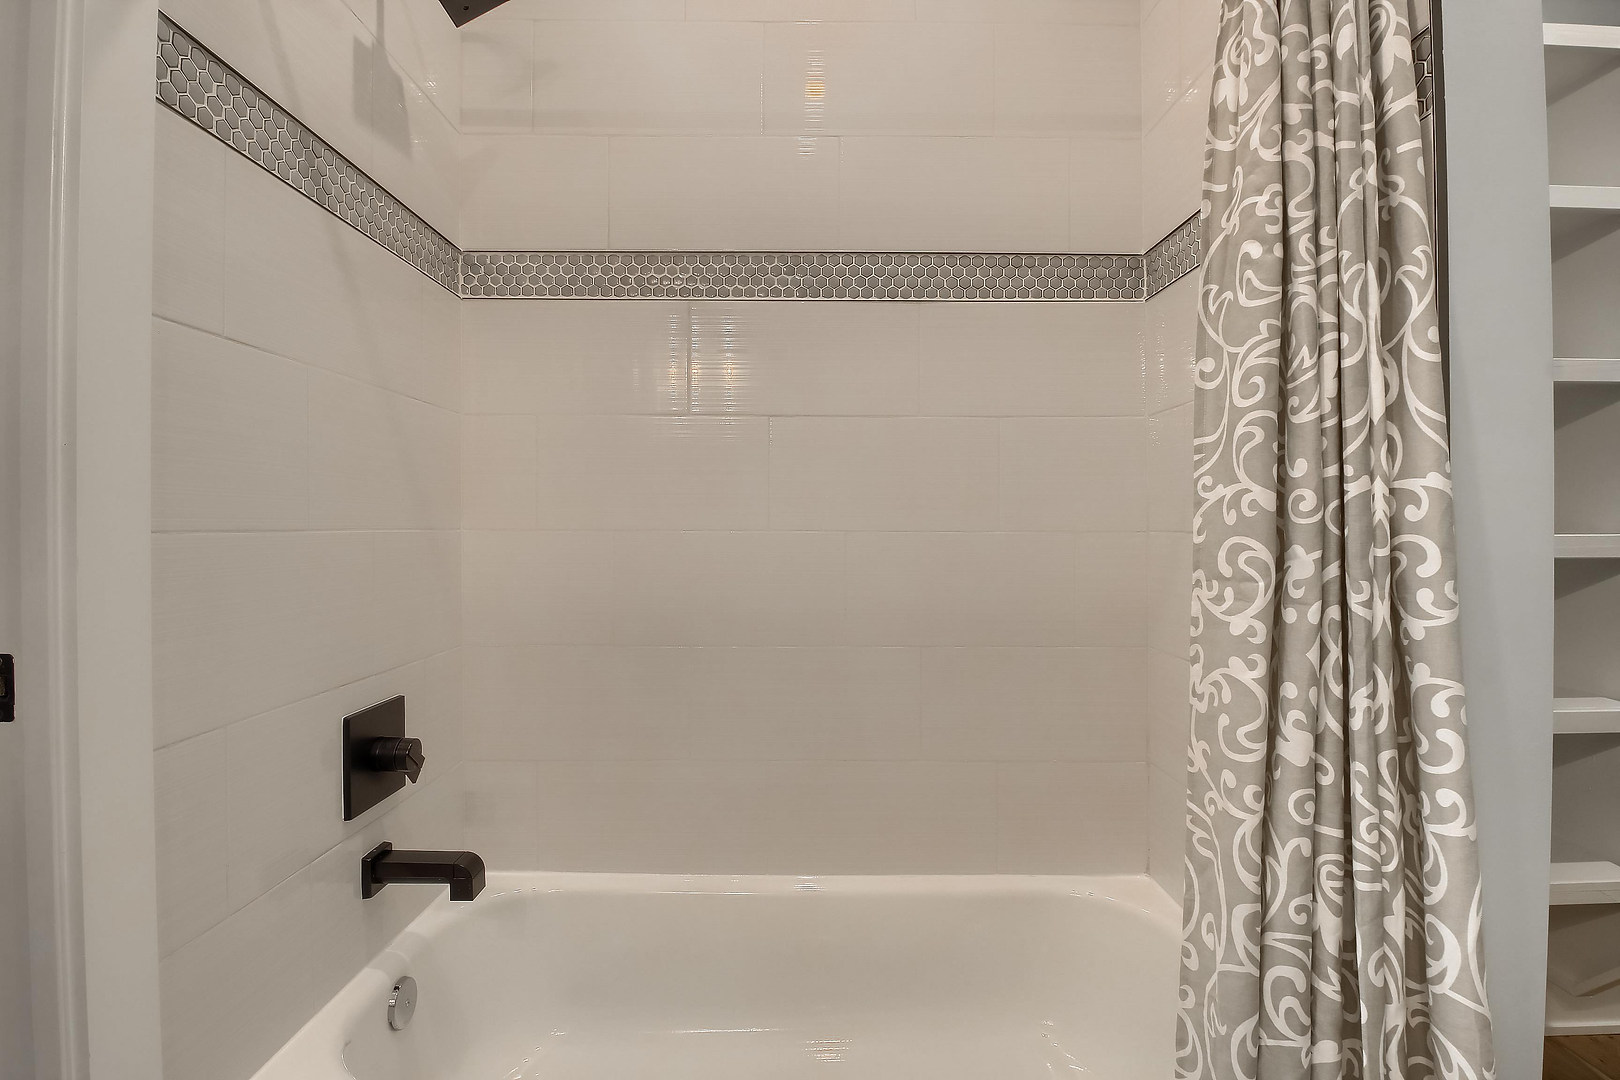 Home Renovation Bathtub on West 29th in Austin, Texas